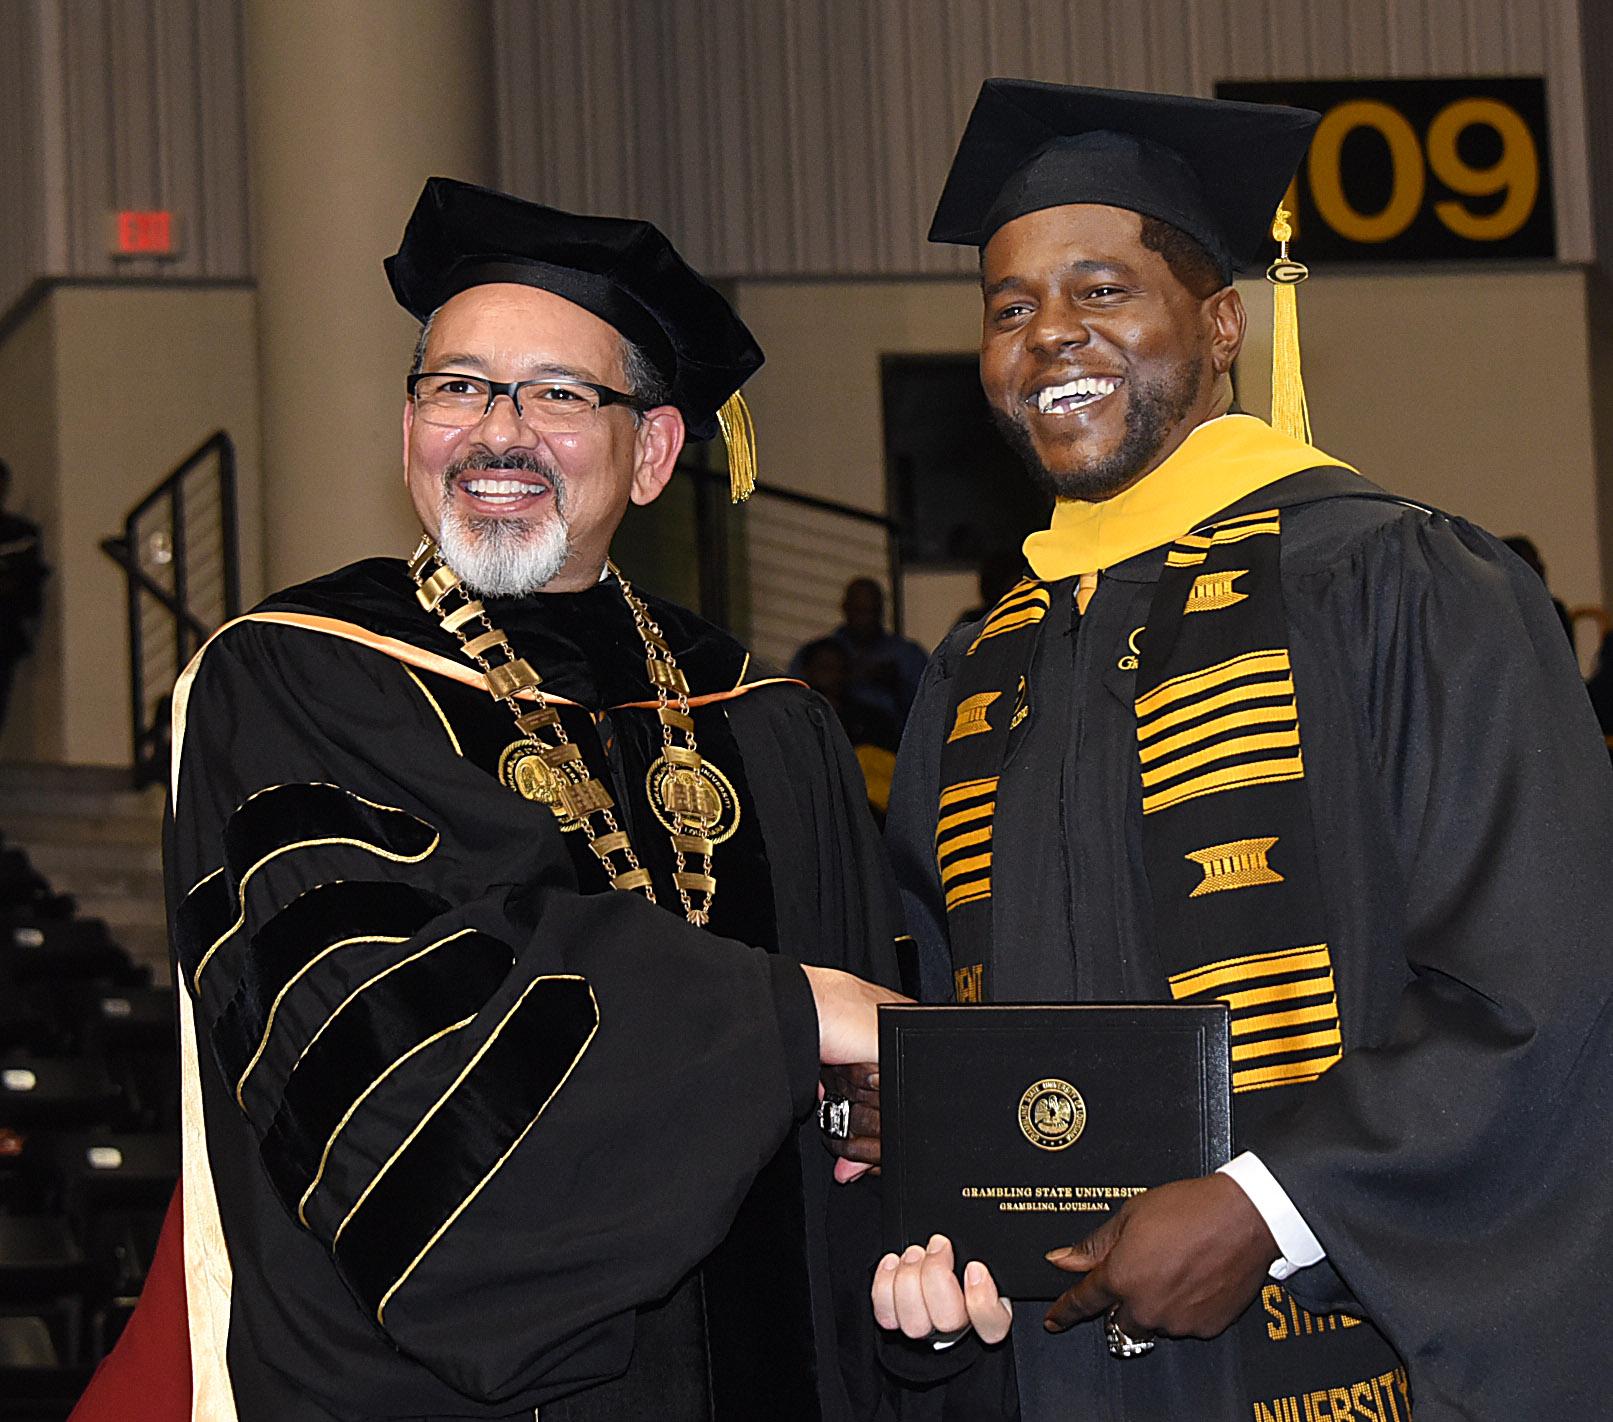 ff77fbb562 Grambling State University - Graduation Replay  Grambling State ...